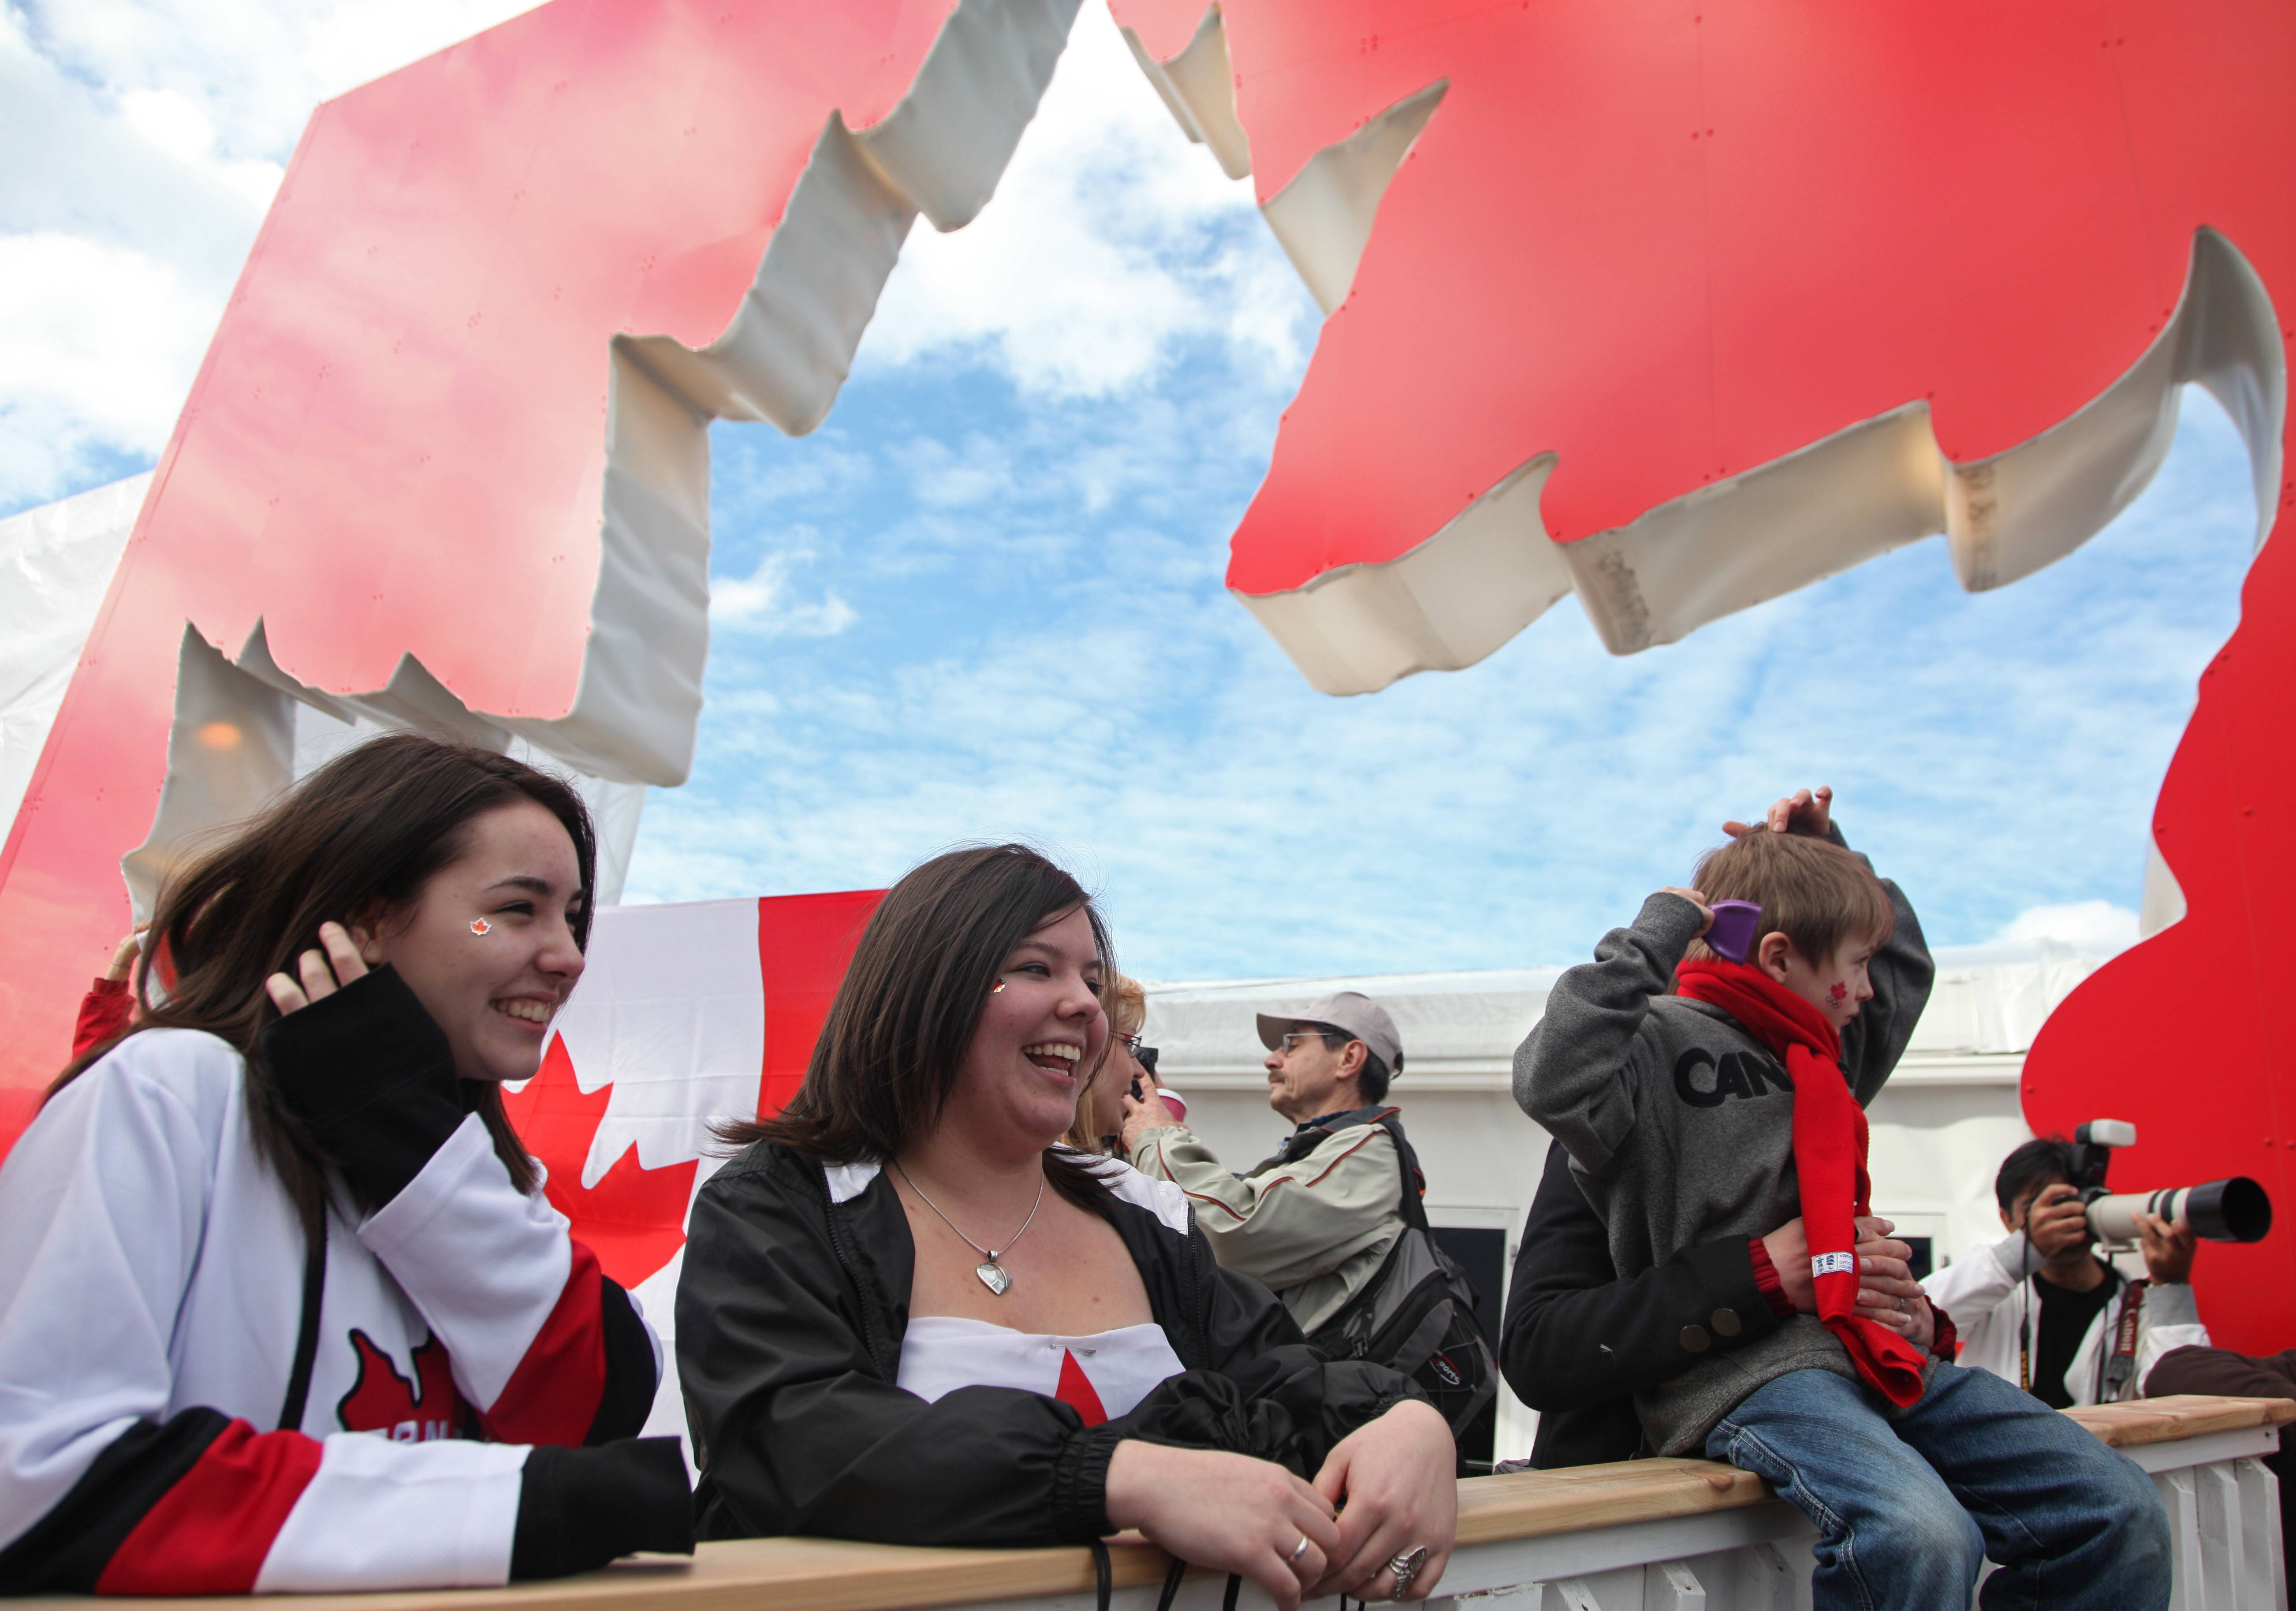 Климат канады: особенности по месяцам, сезонам, по провинциям